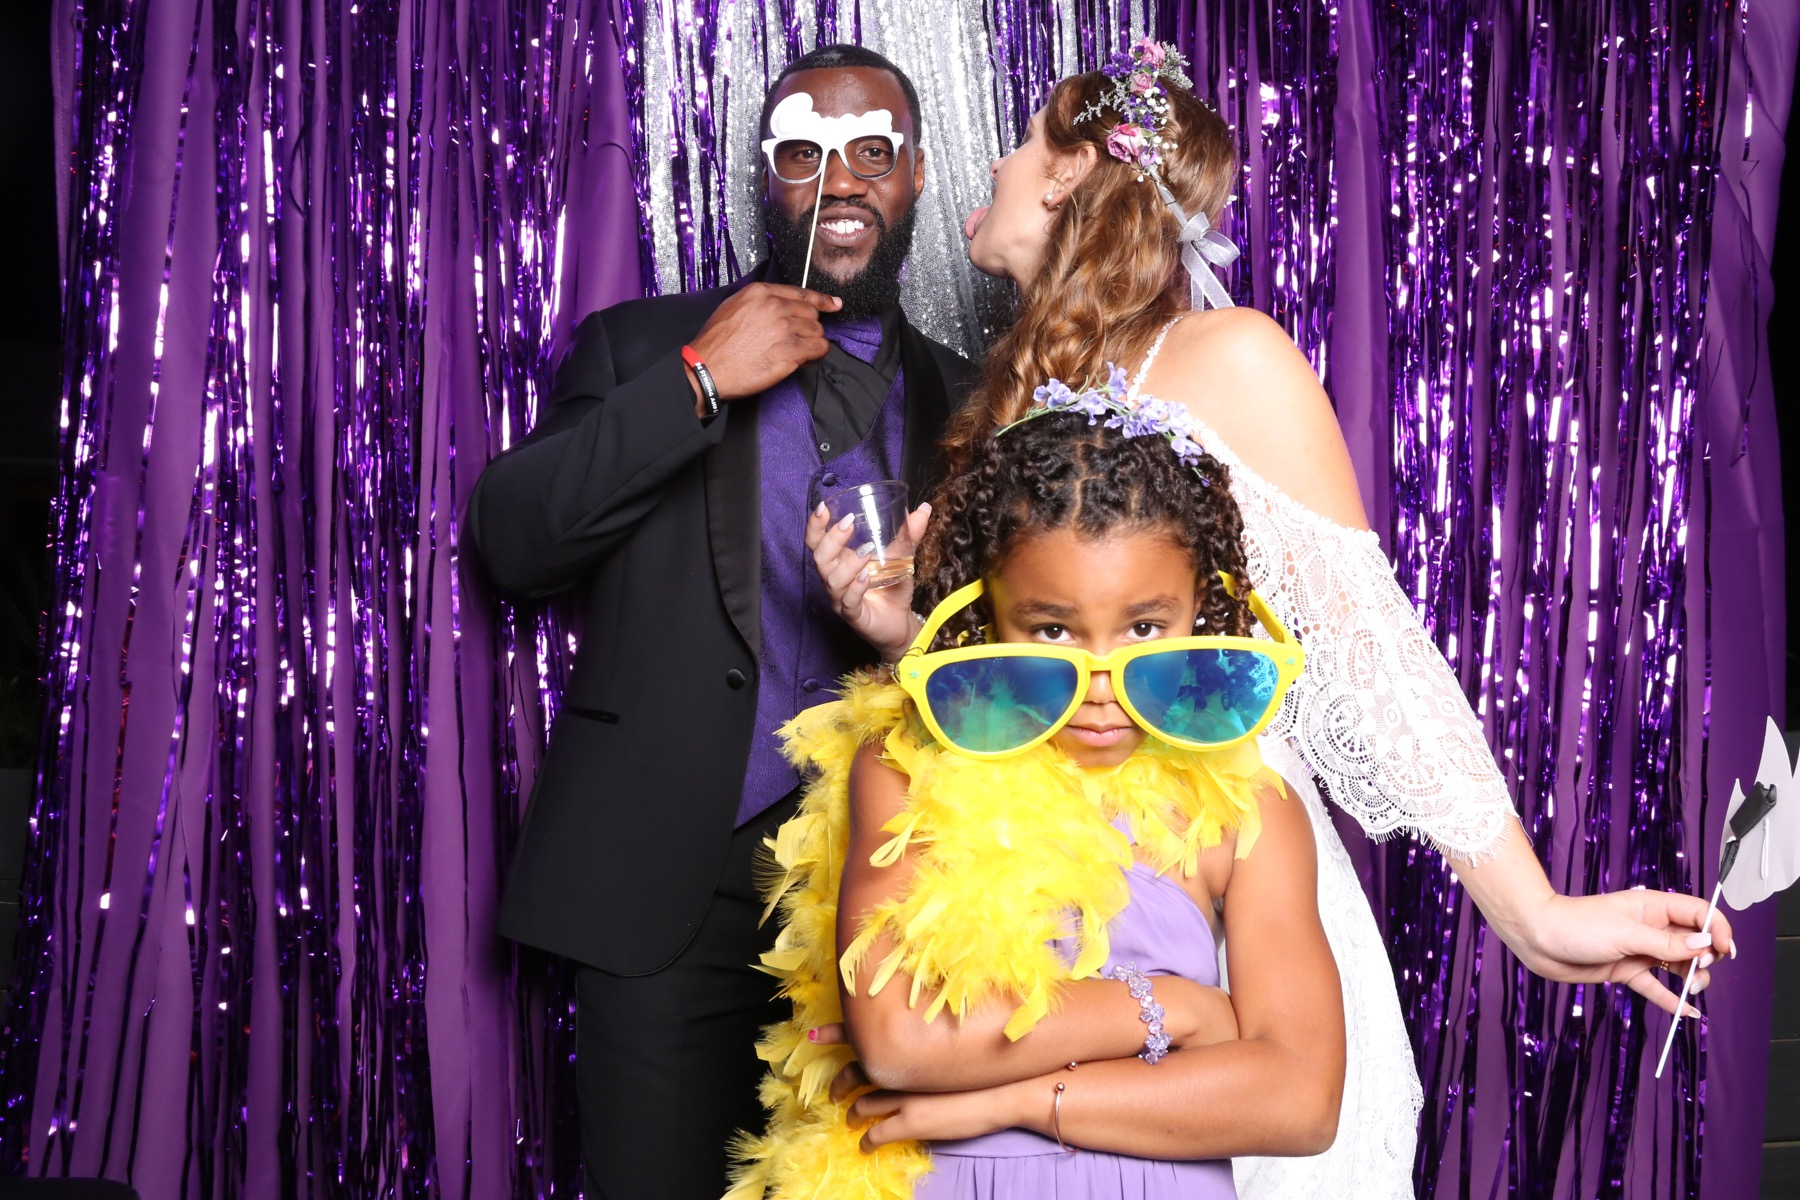 Booth Chamber Photo Booth Harmony Gardens wedding antoine Hart de leon springs photography_67.jpeg